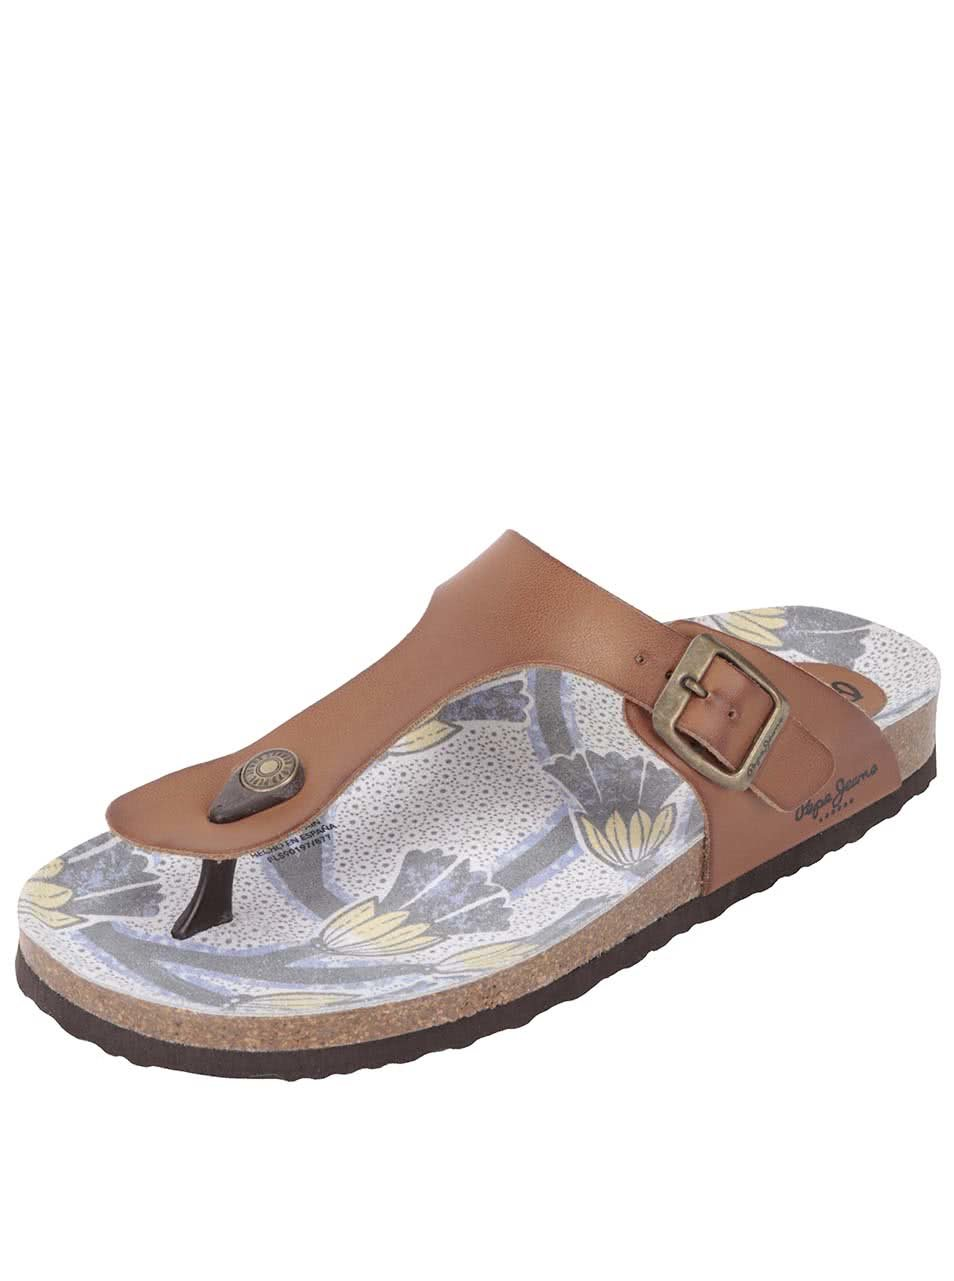 Hnědé dámské pantofle Pepe Jeans